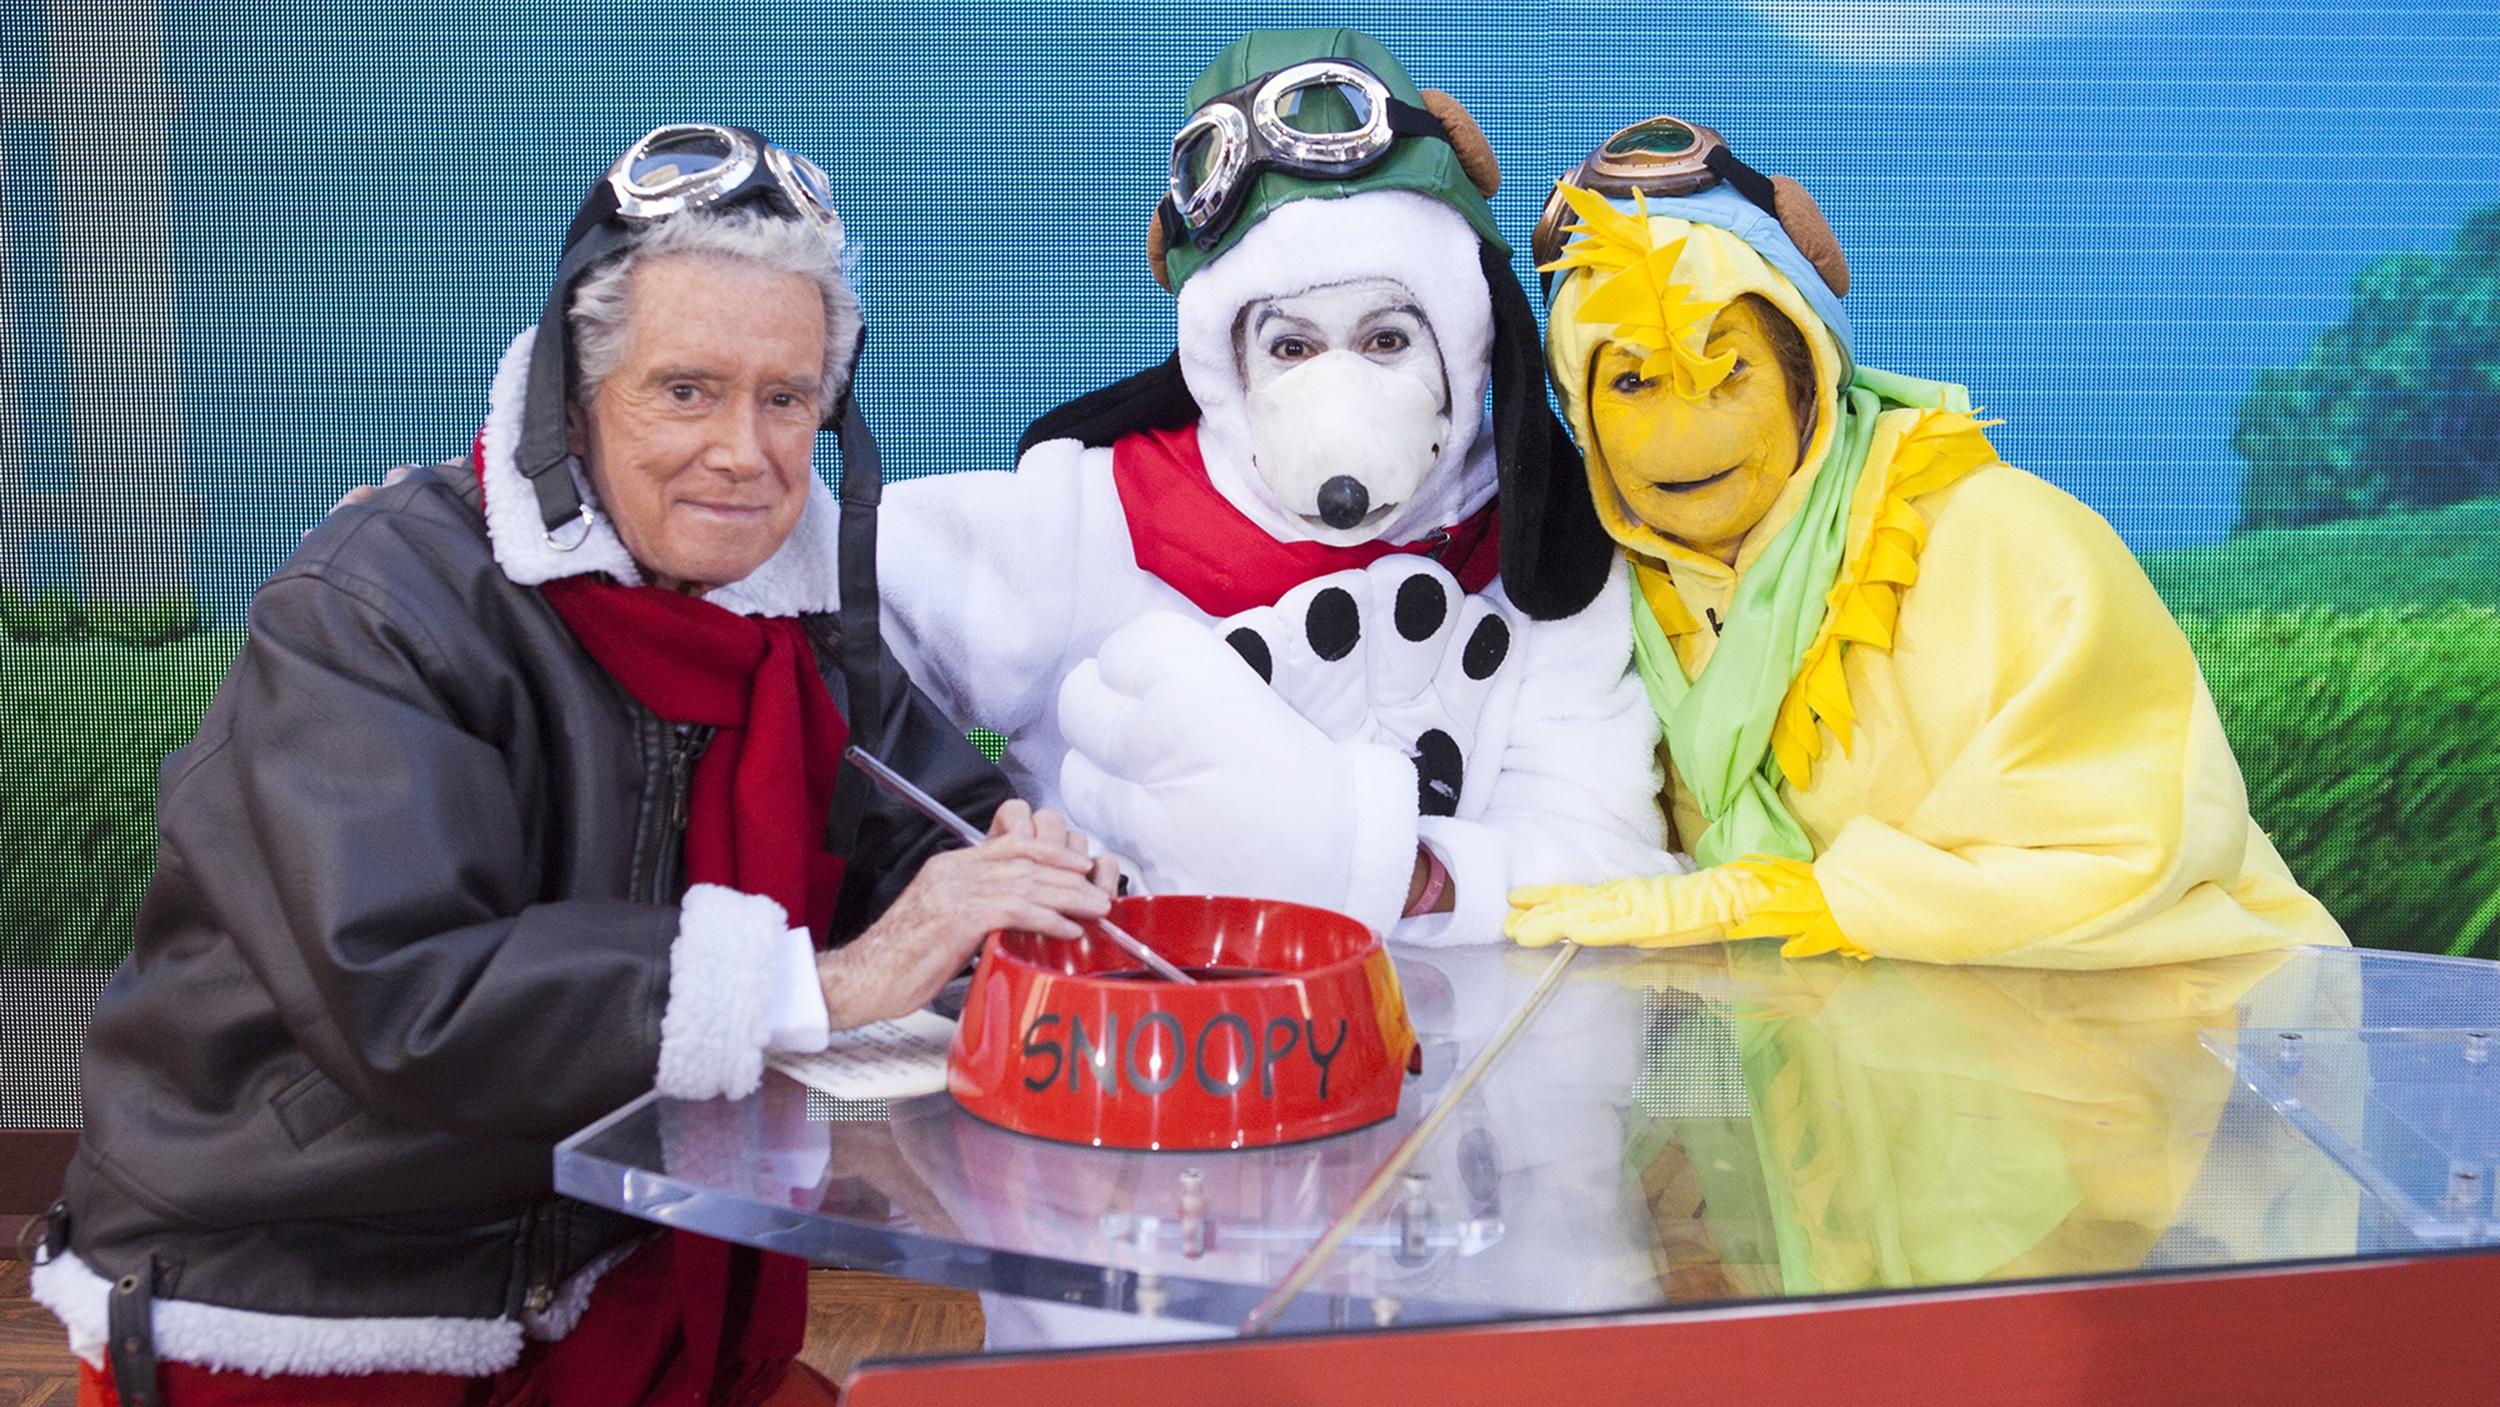 See Kathie Lee, Hoda's Halloween antics with guest star Regis ...